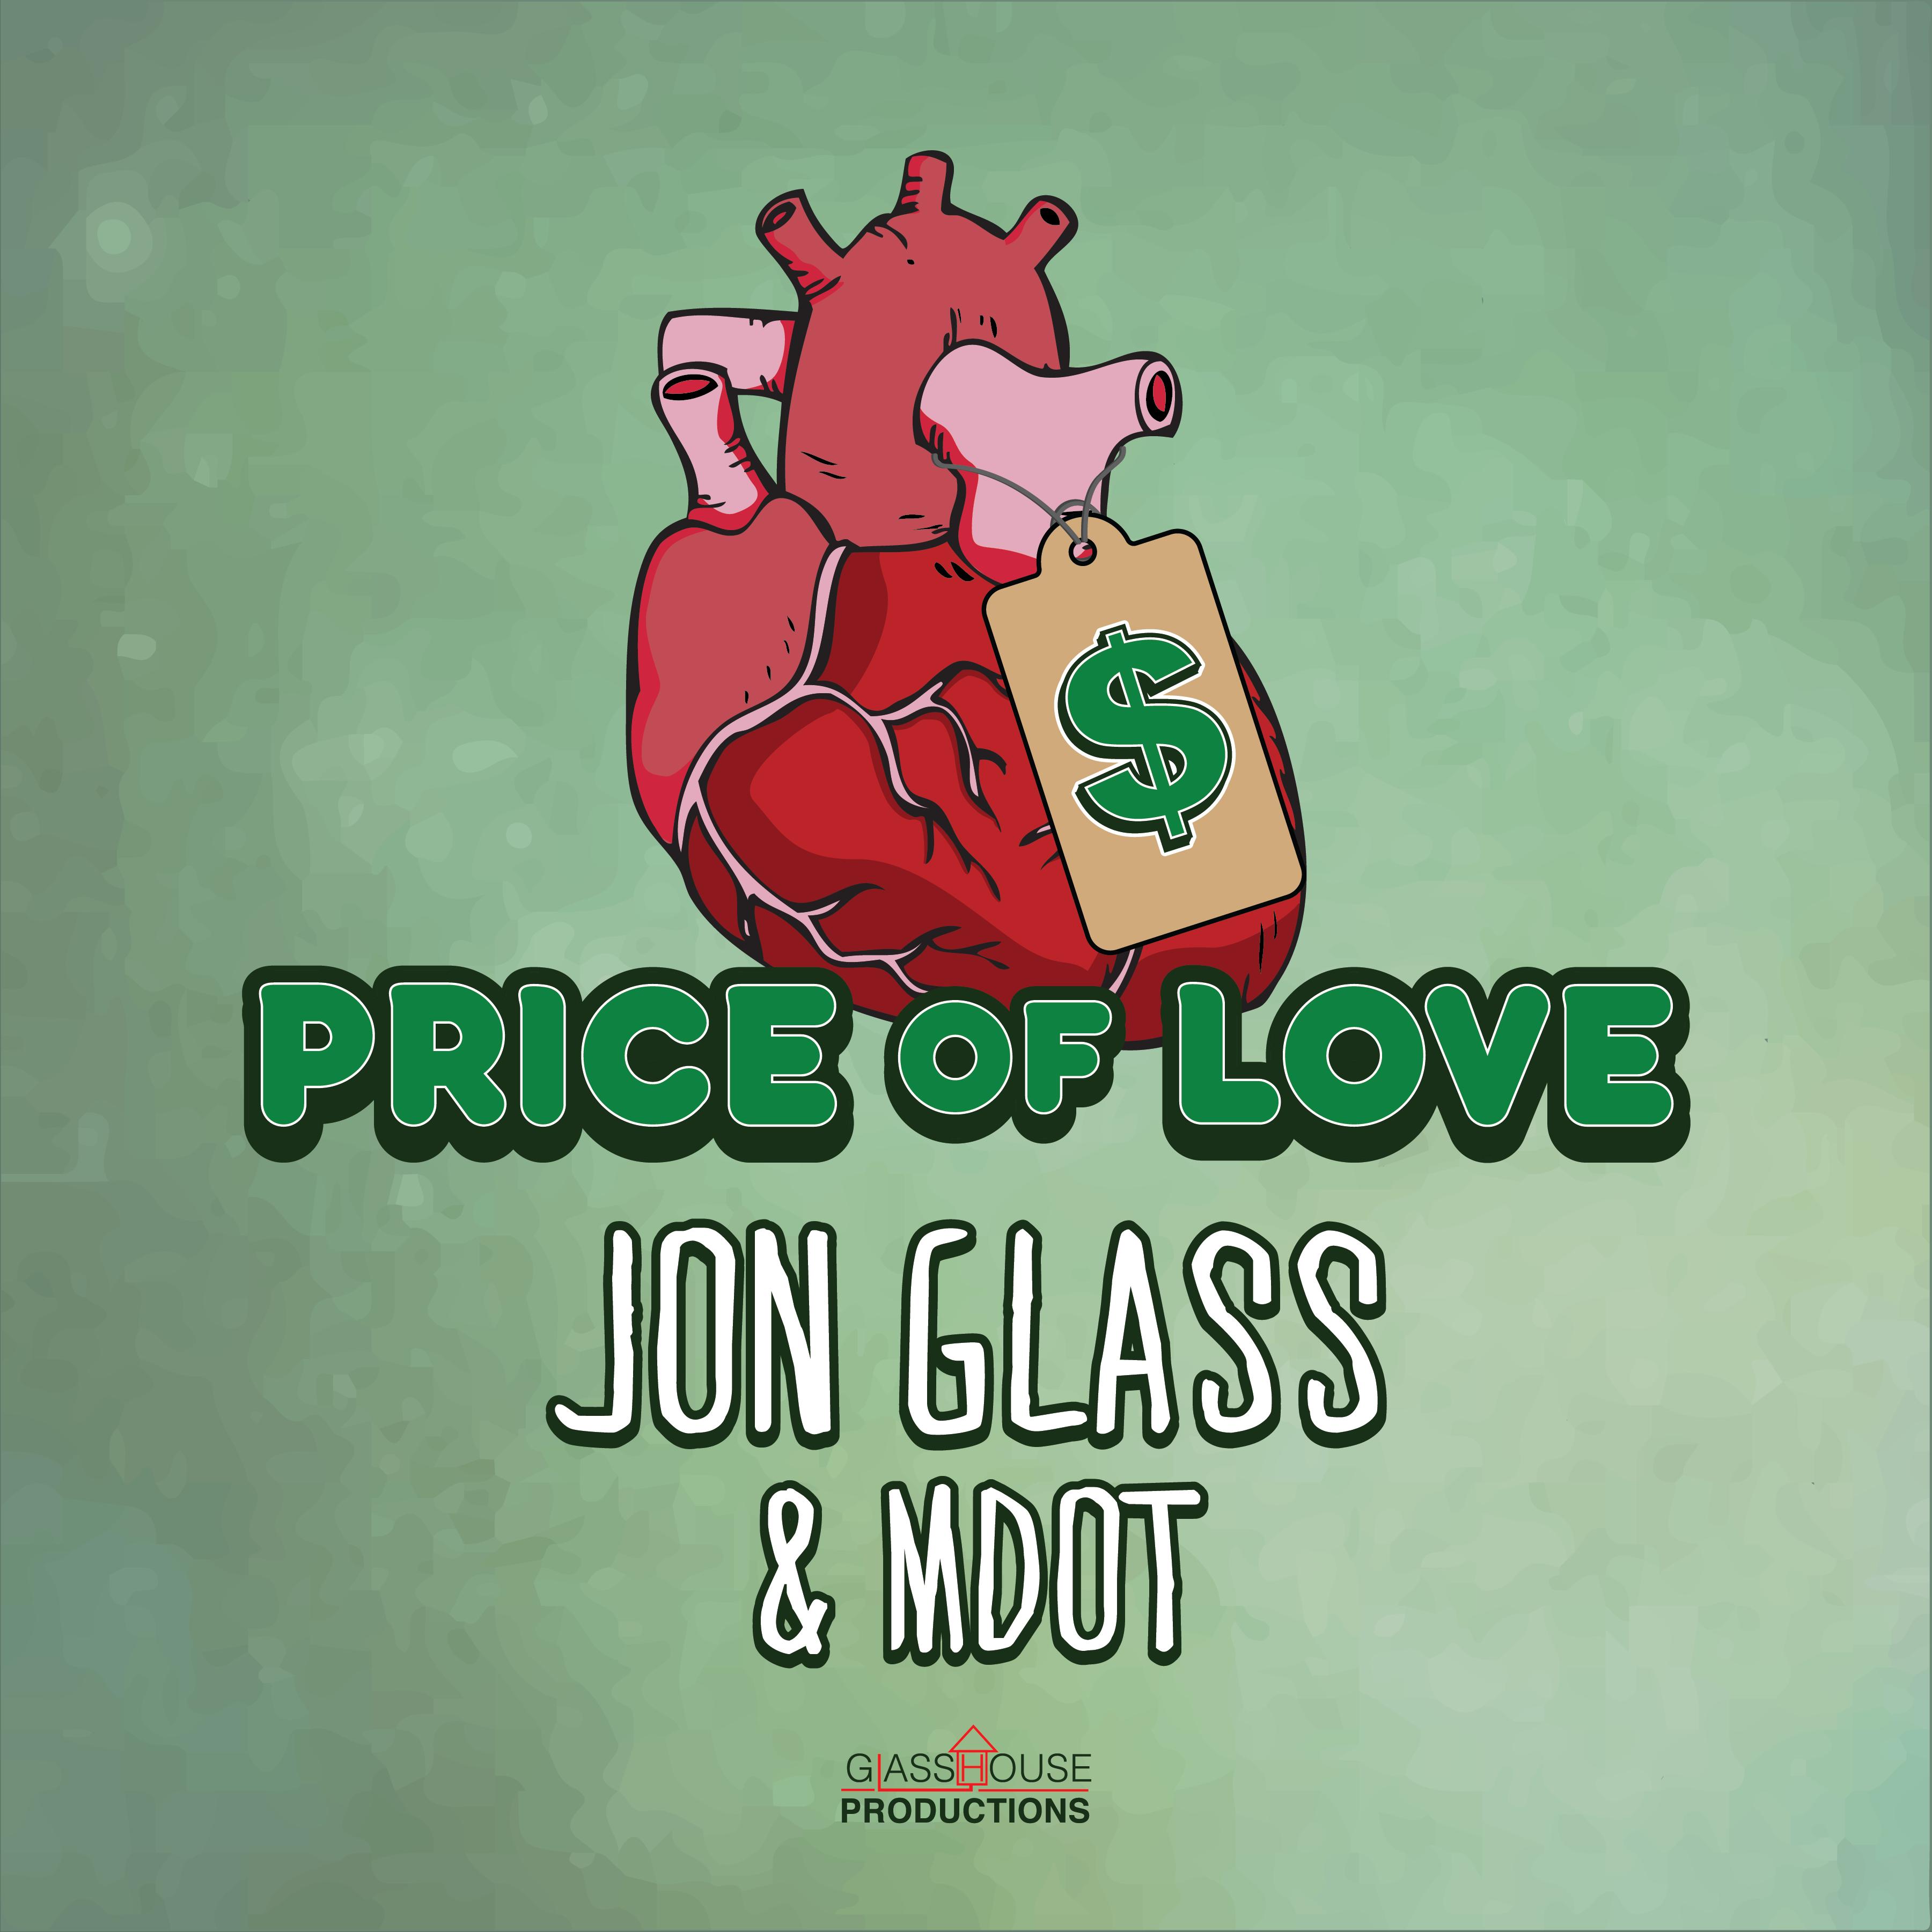 New Music Jon Glass Featuring M Dot Price Of Love New Music Hip Hop Music Rapper Big